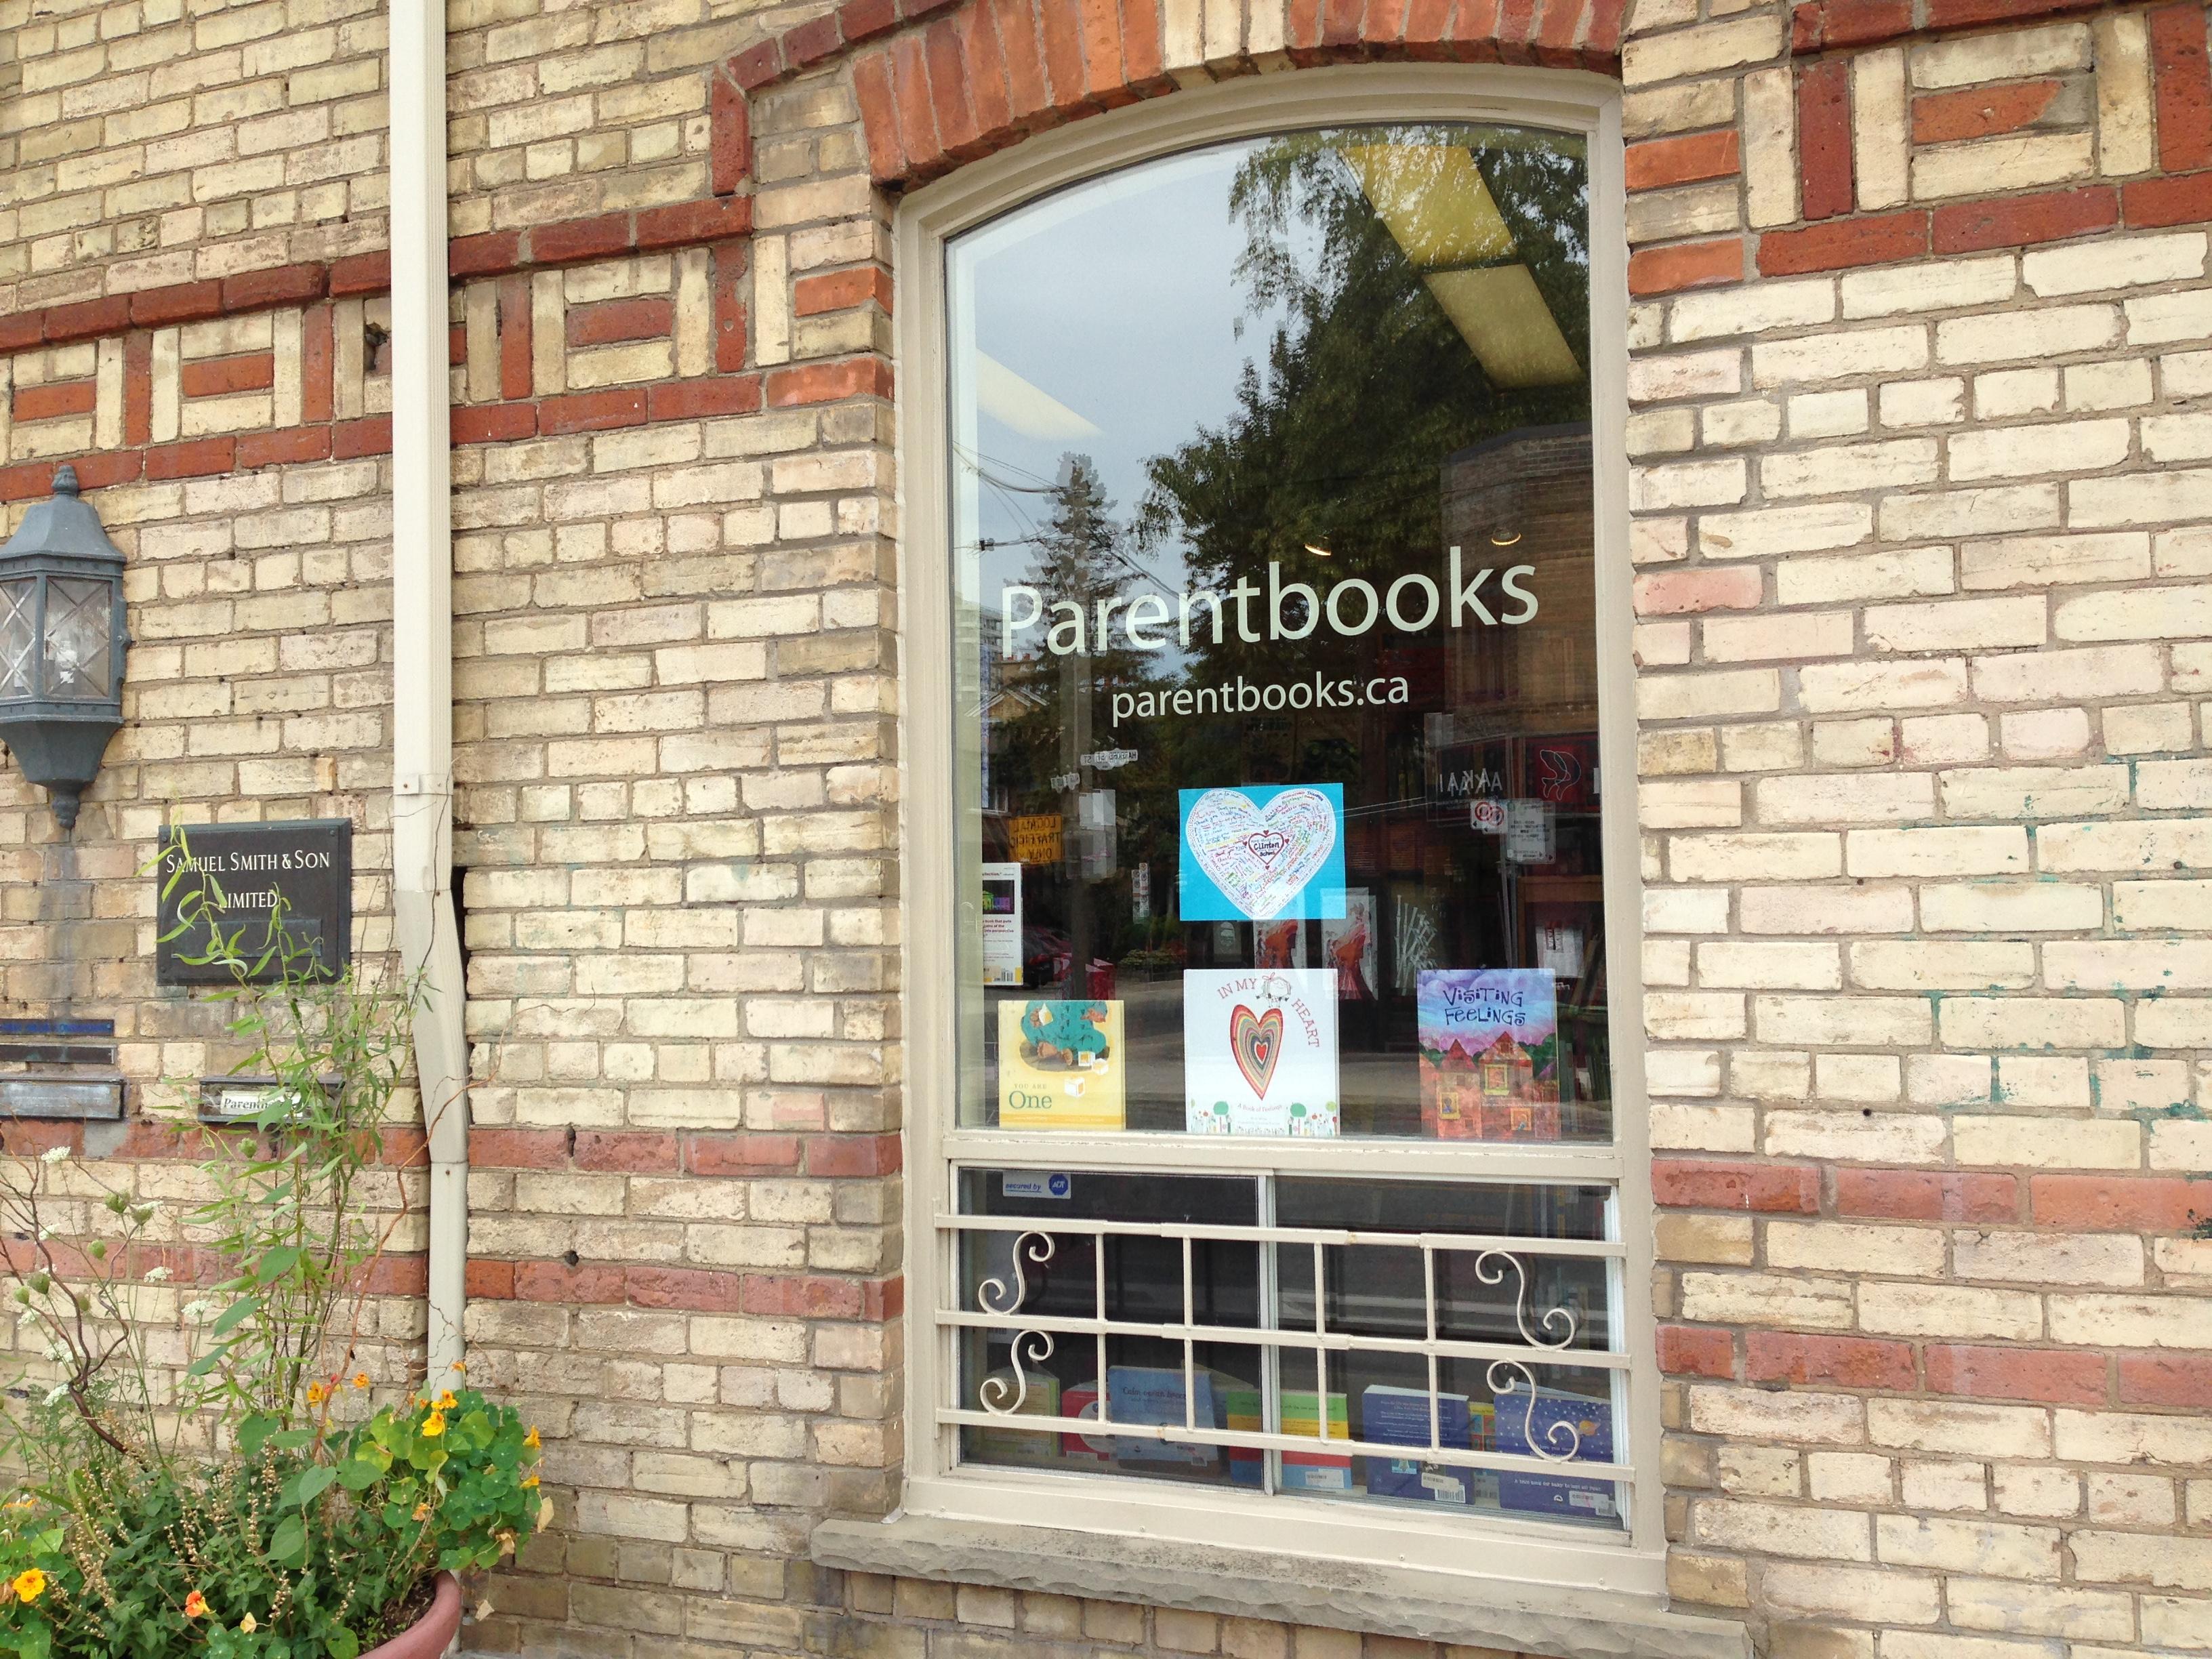 Parentbooks exterior